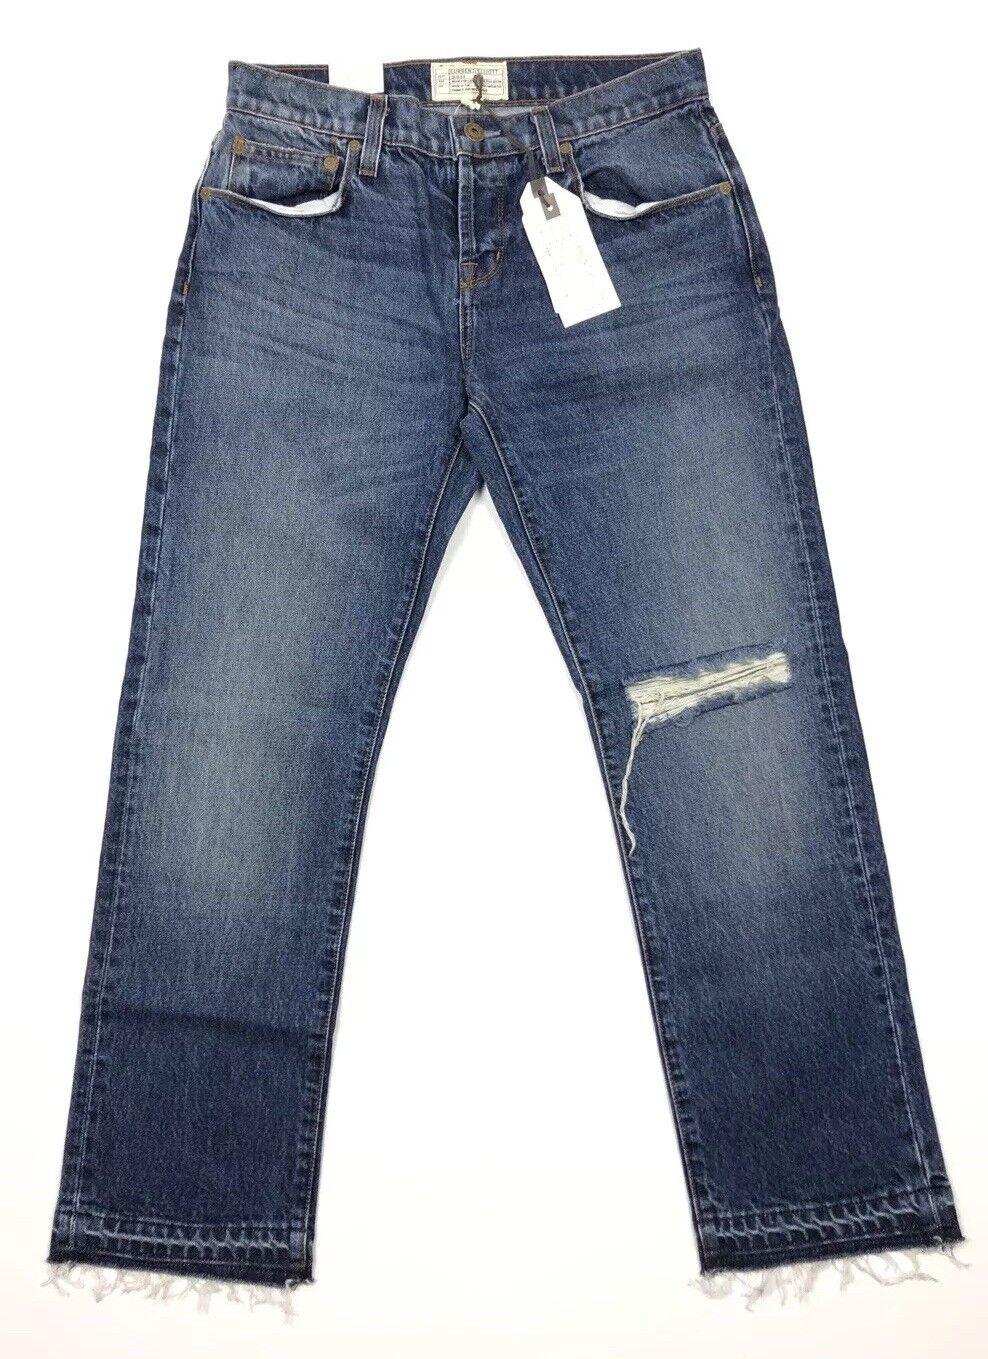 Current Elliott 30 Credver Jeans Distressed Raw Hem Denim Women's NWT